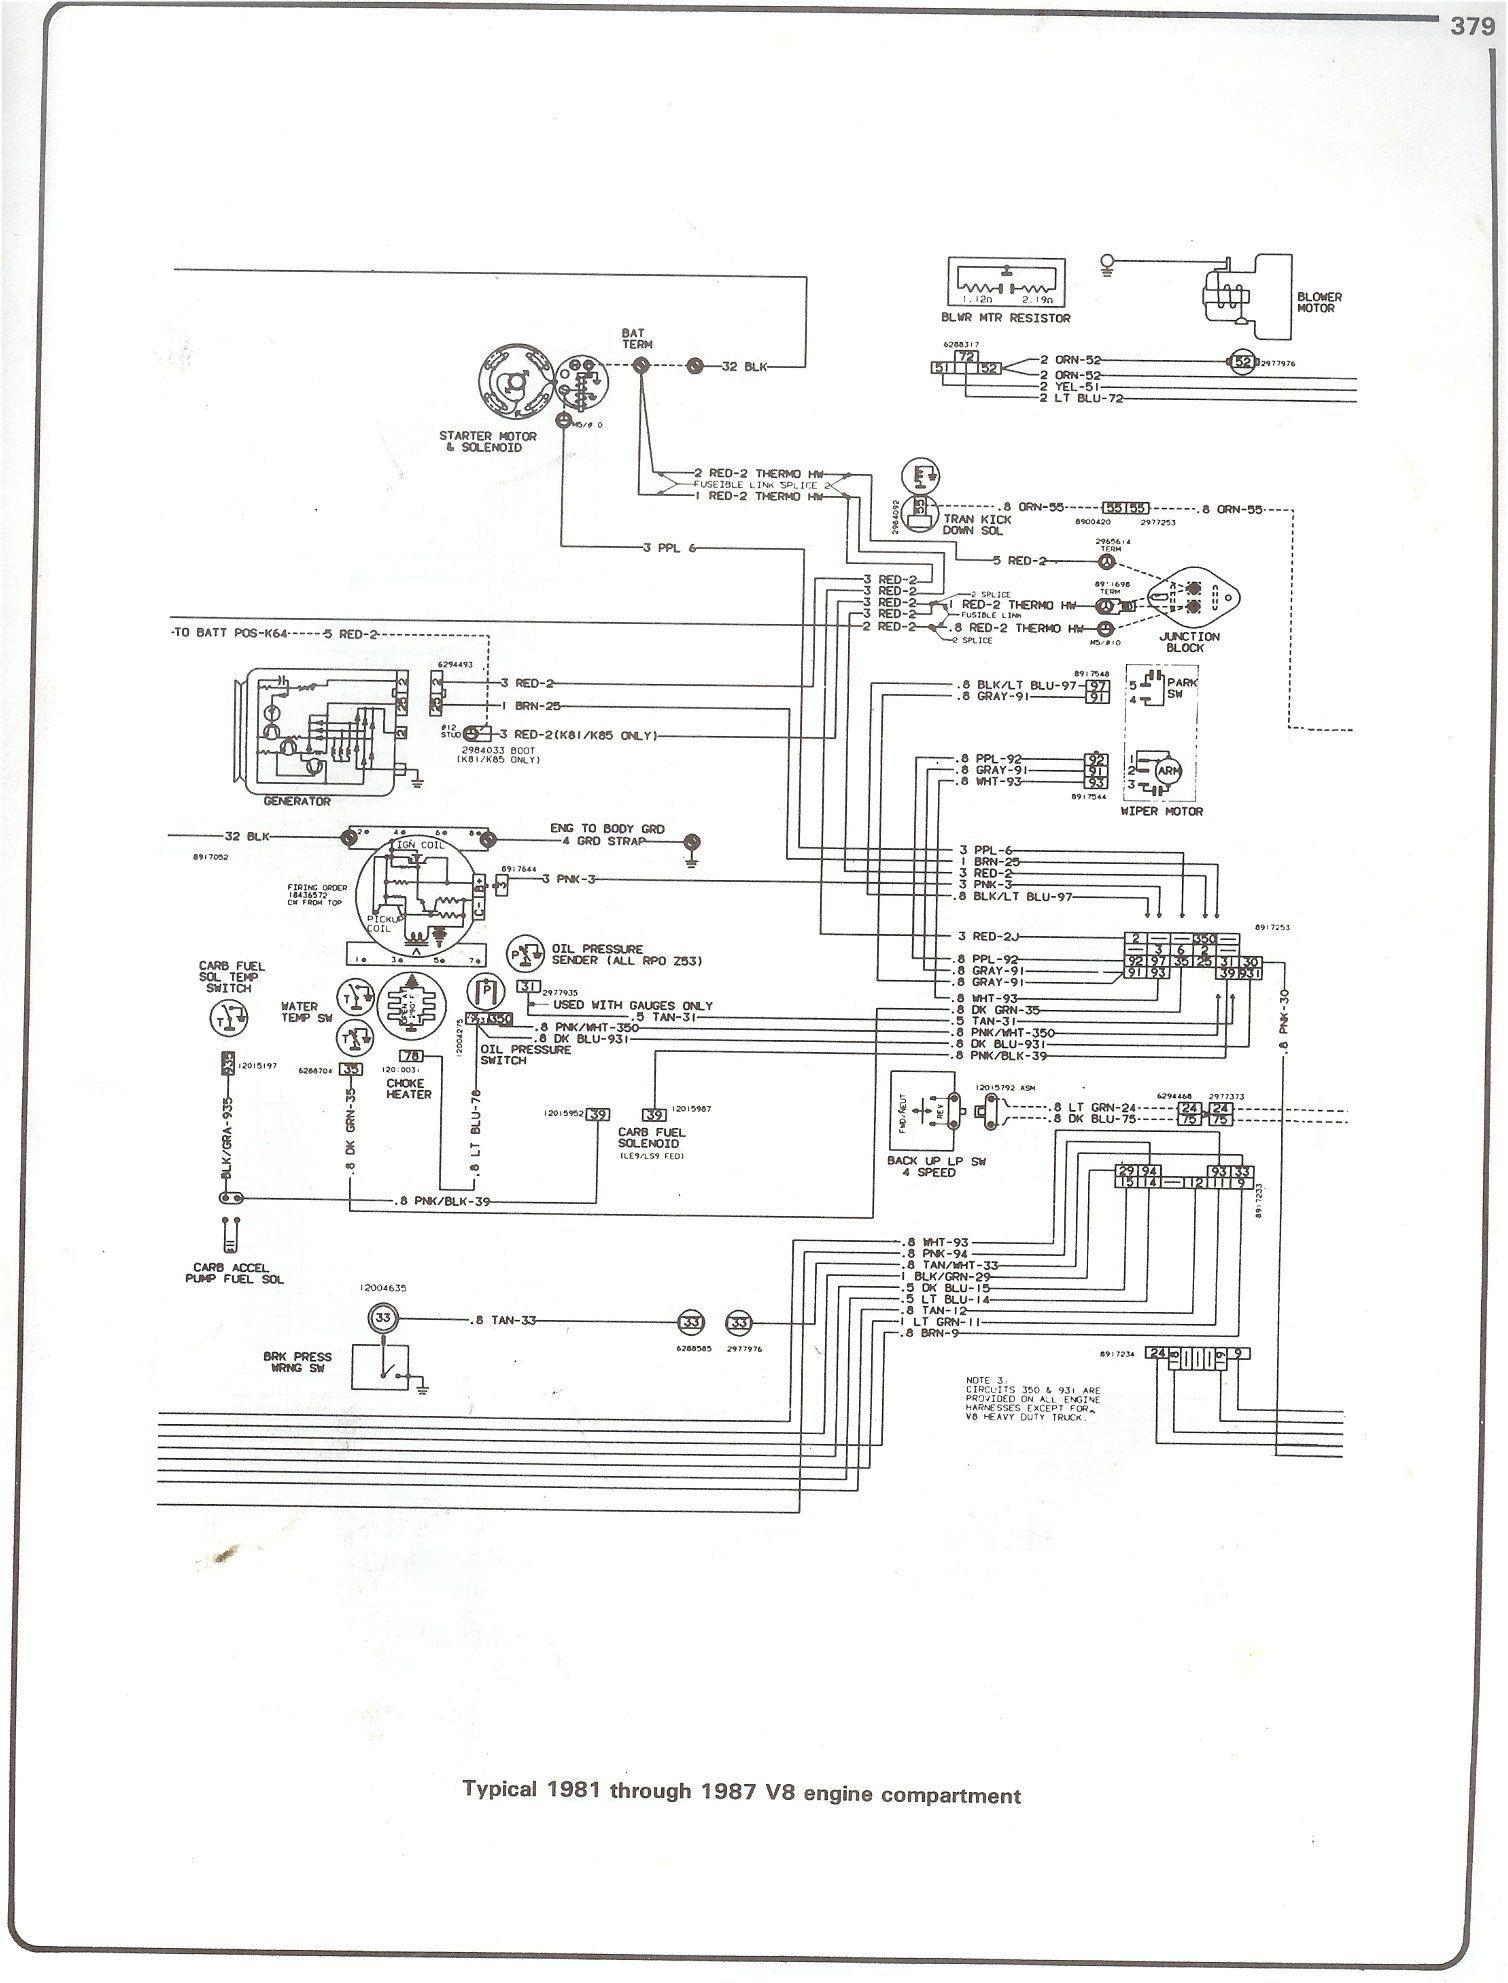 1979 Chevy Truck Chevy Trucks Truck Engine